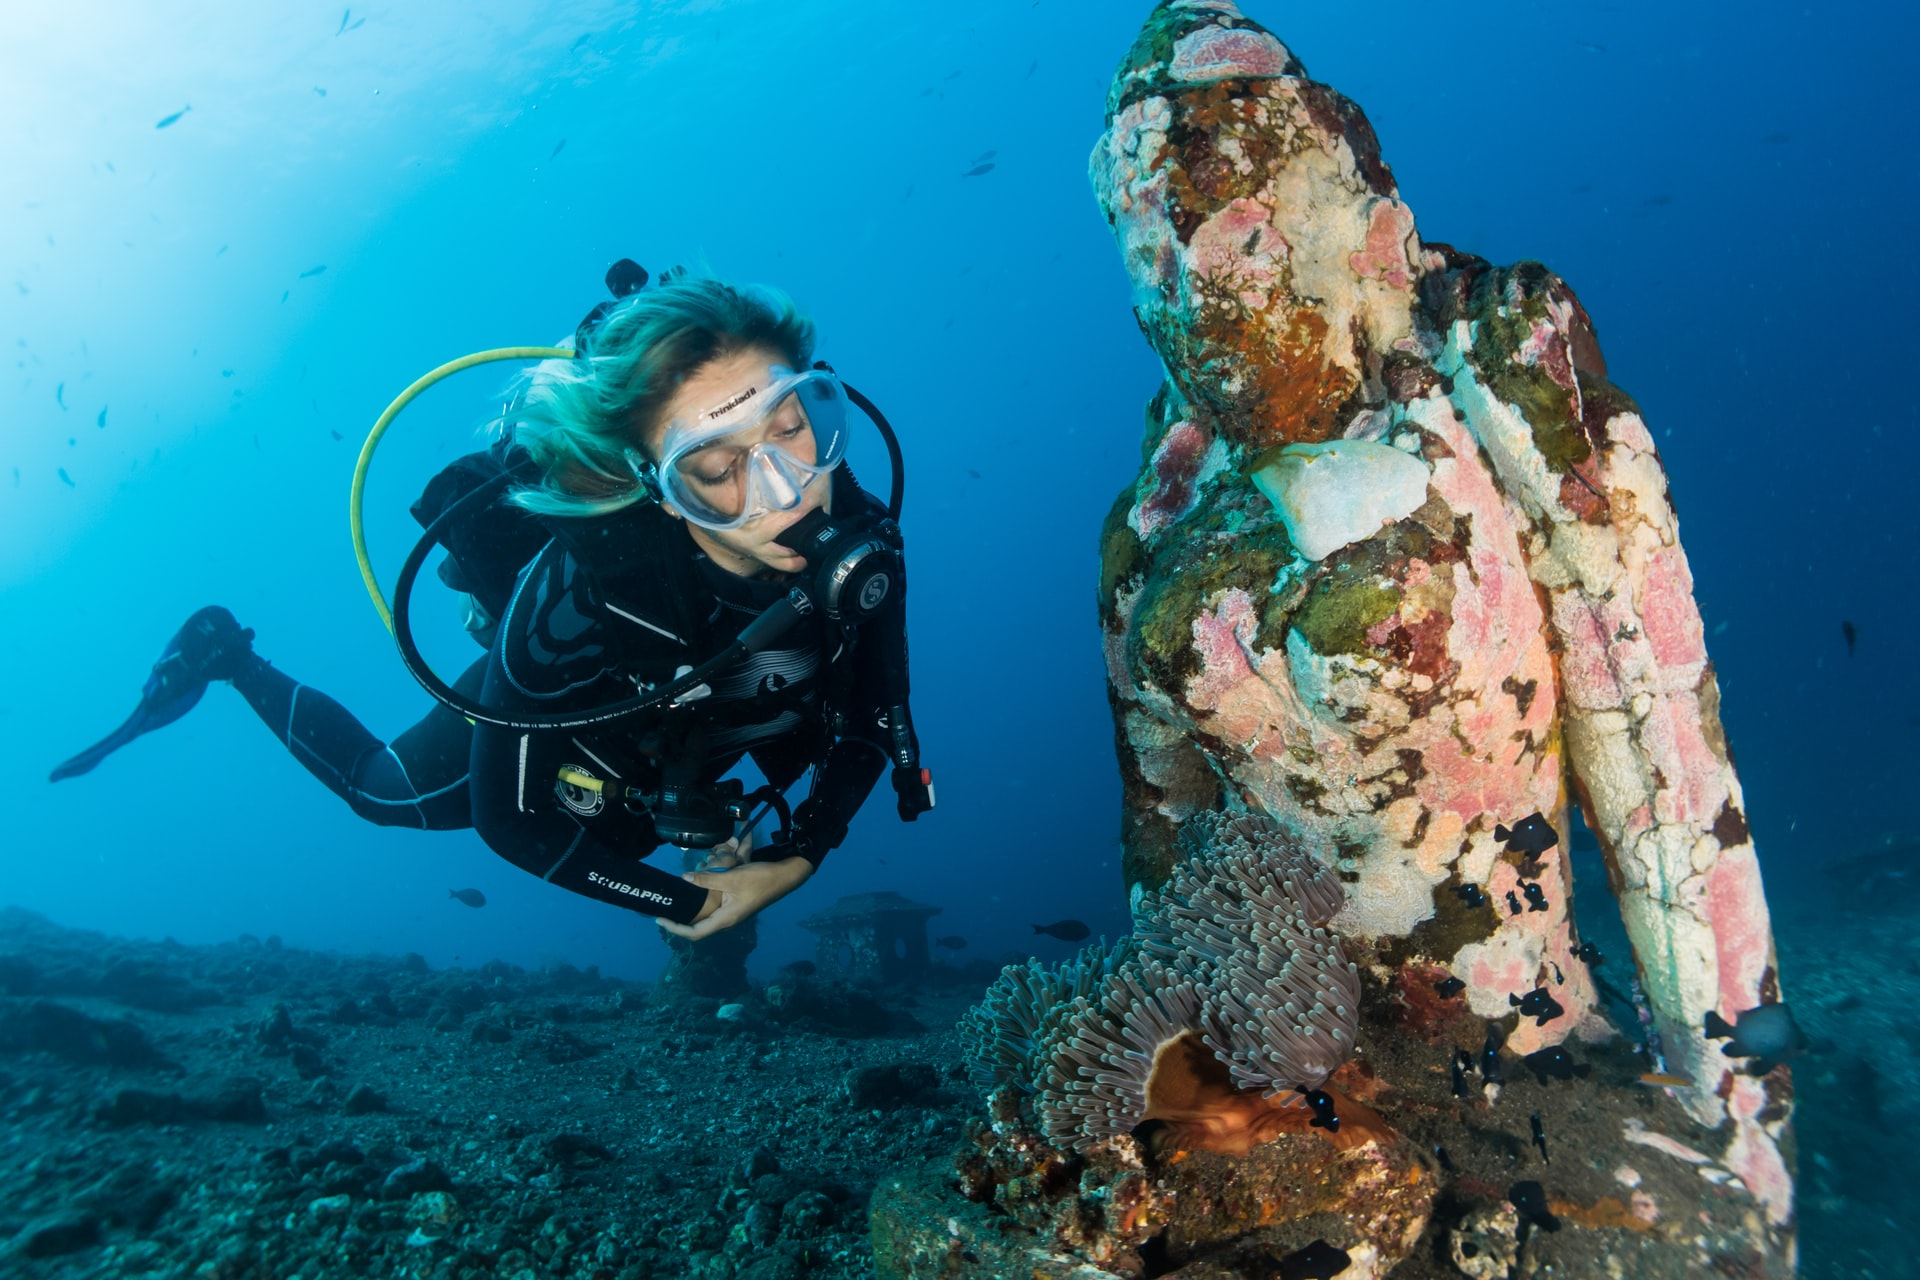 Diving in Bali (photo: Sebastian Pena Lambarri)